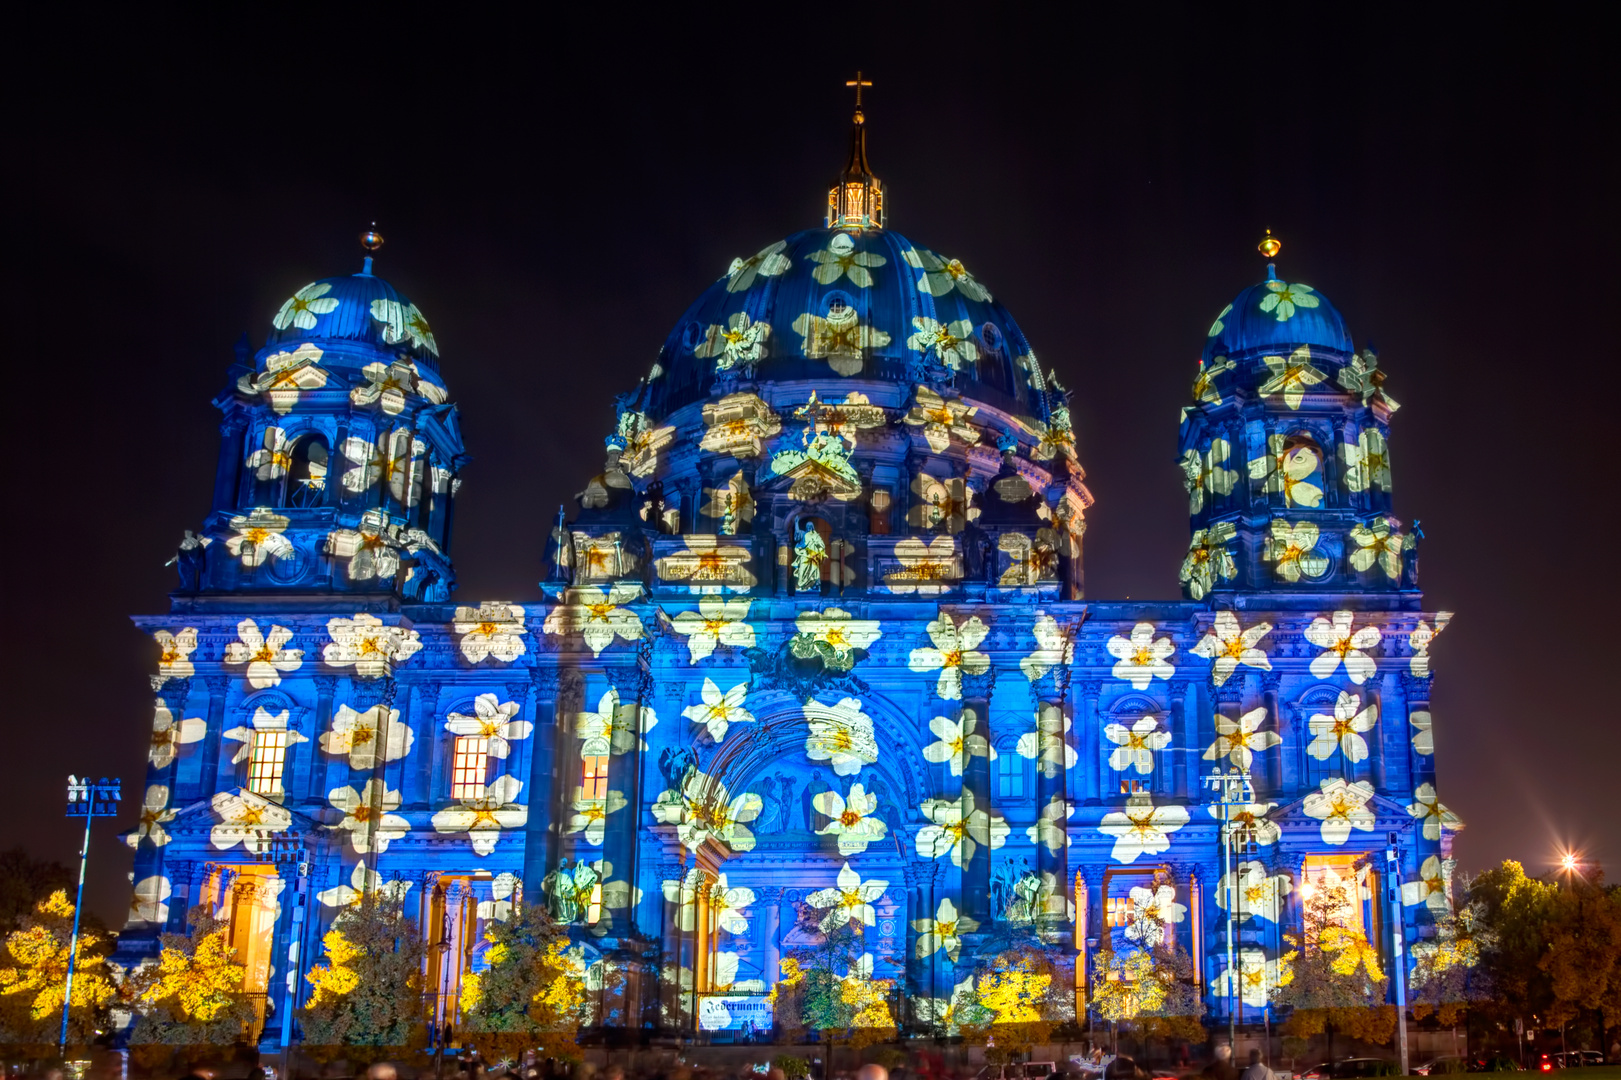 Berliner Dom 2013 Festival of lights